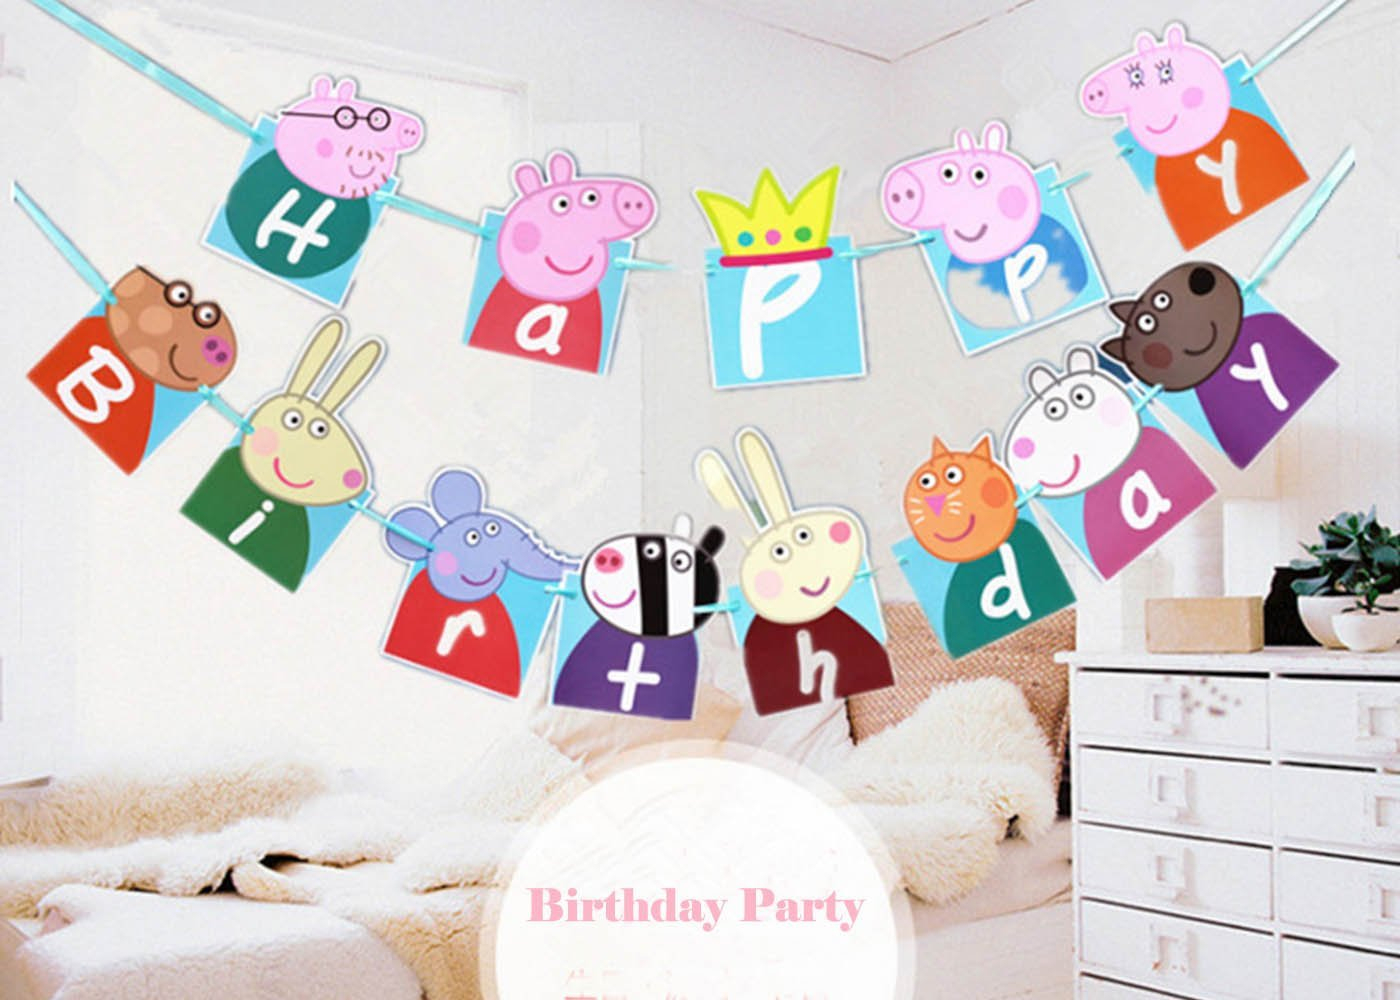 Free Printable Peppa Pig Banners - 20.17.hus-Noorderpad.de • - Peppa Pig Birthday Banner Printable Free